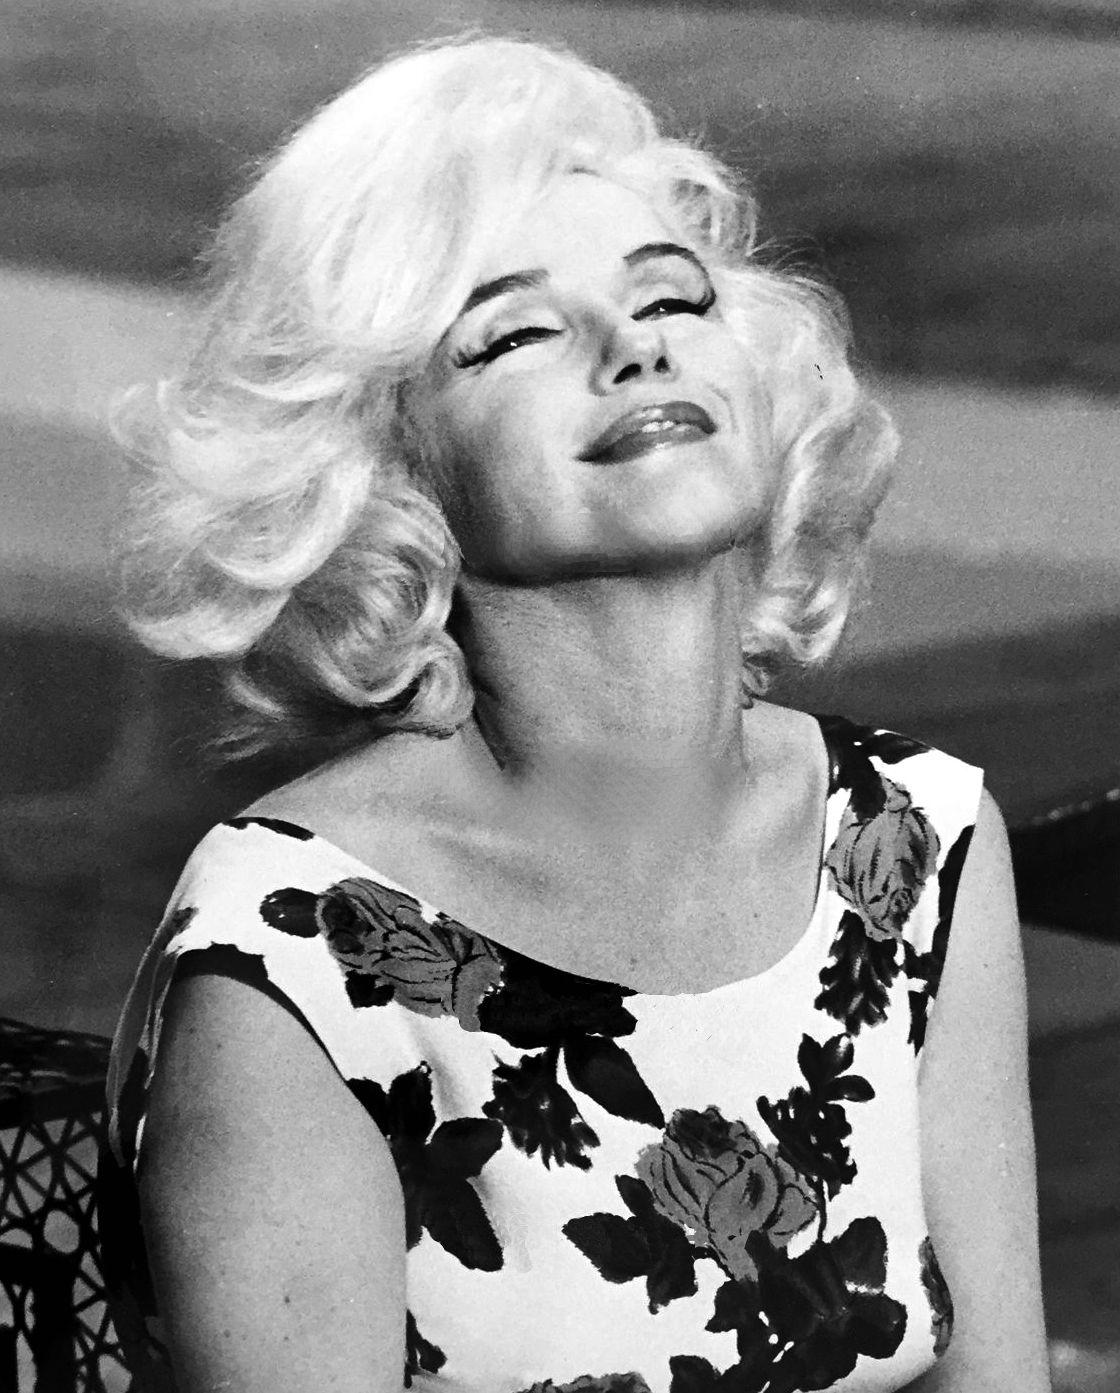 Marilyn Monroe on the set of